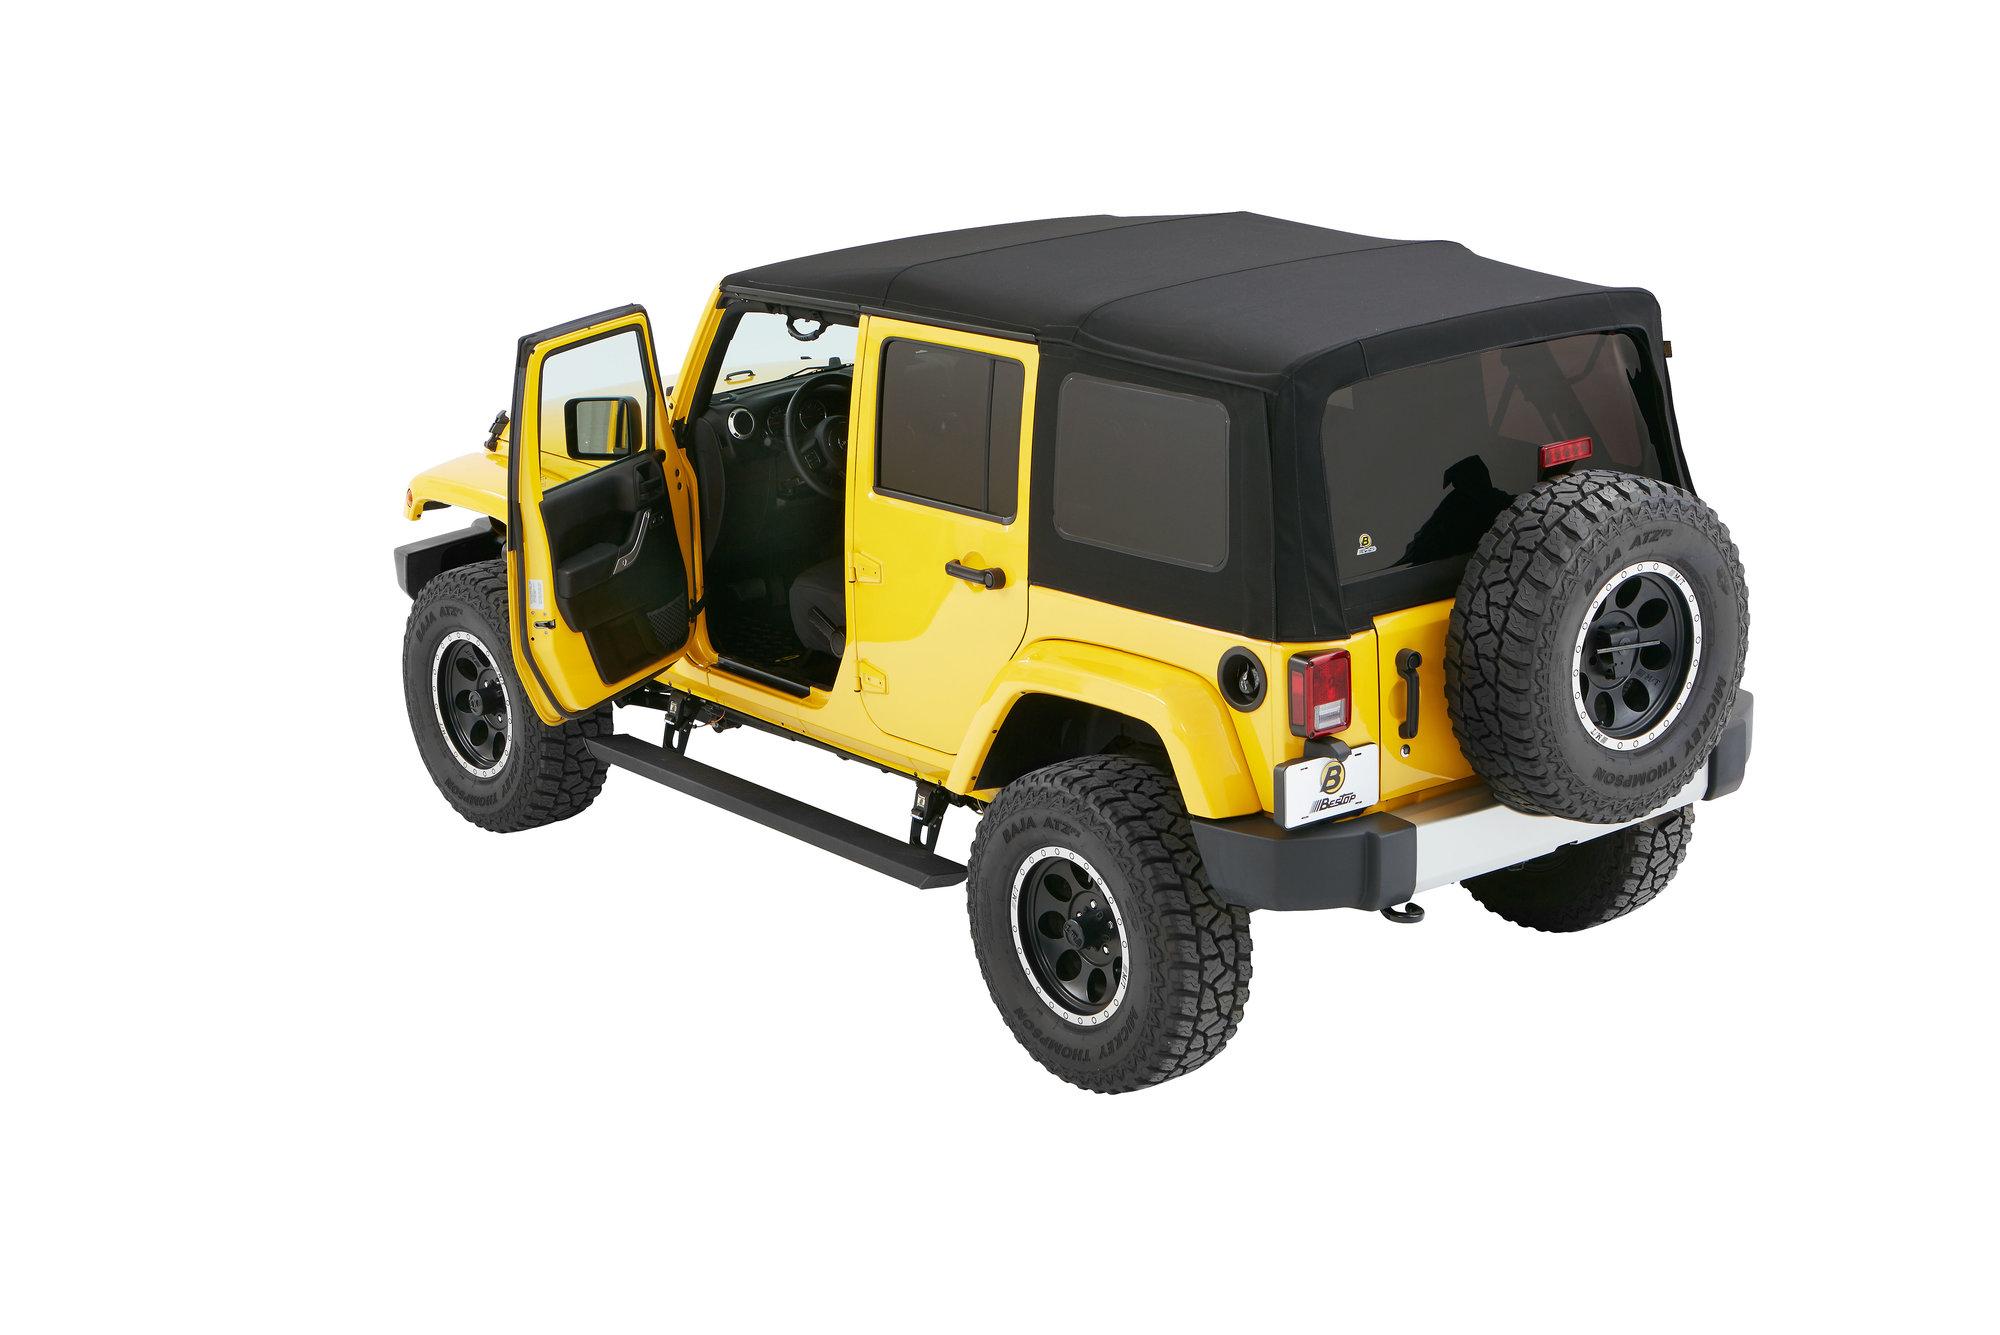 hight resolution of bestop 75652 15 powerboard nx wireless sidesteps for 07 18 jeep wrangler unlimited jk quadratec